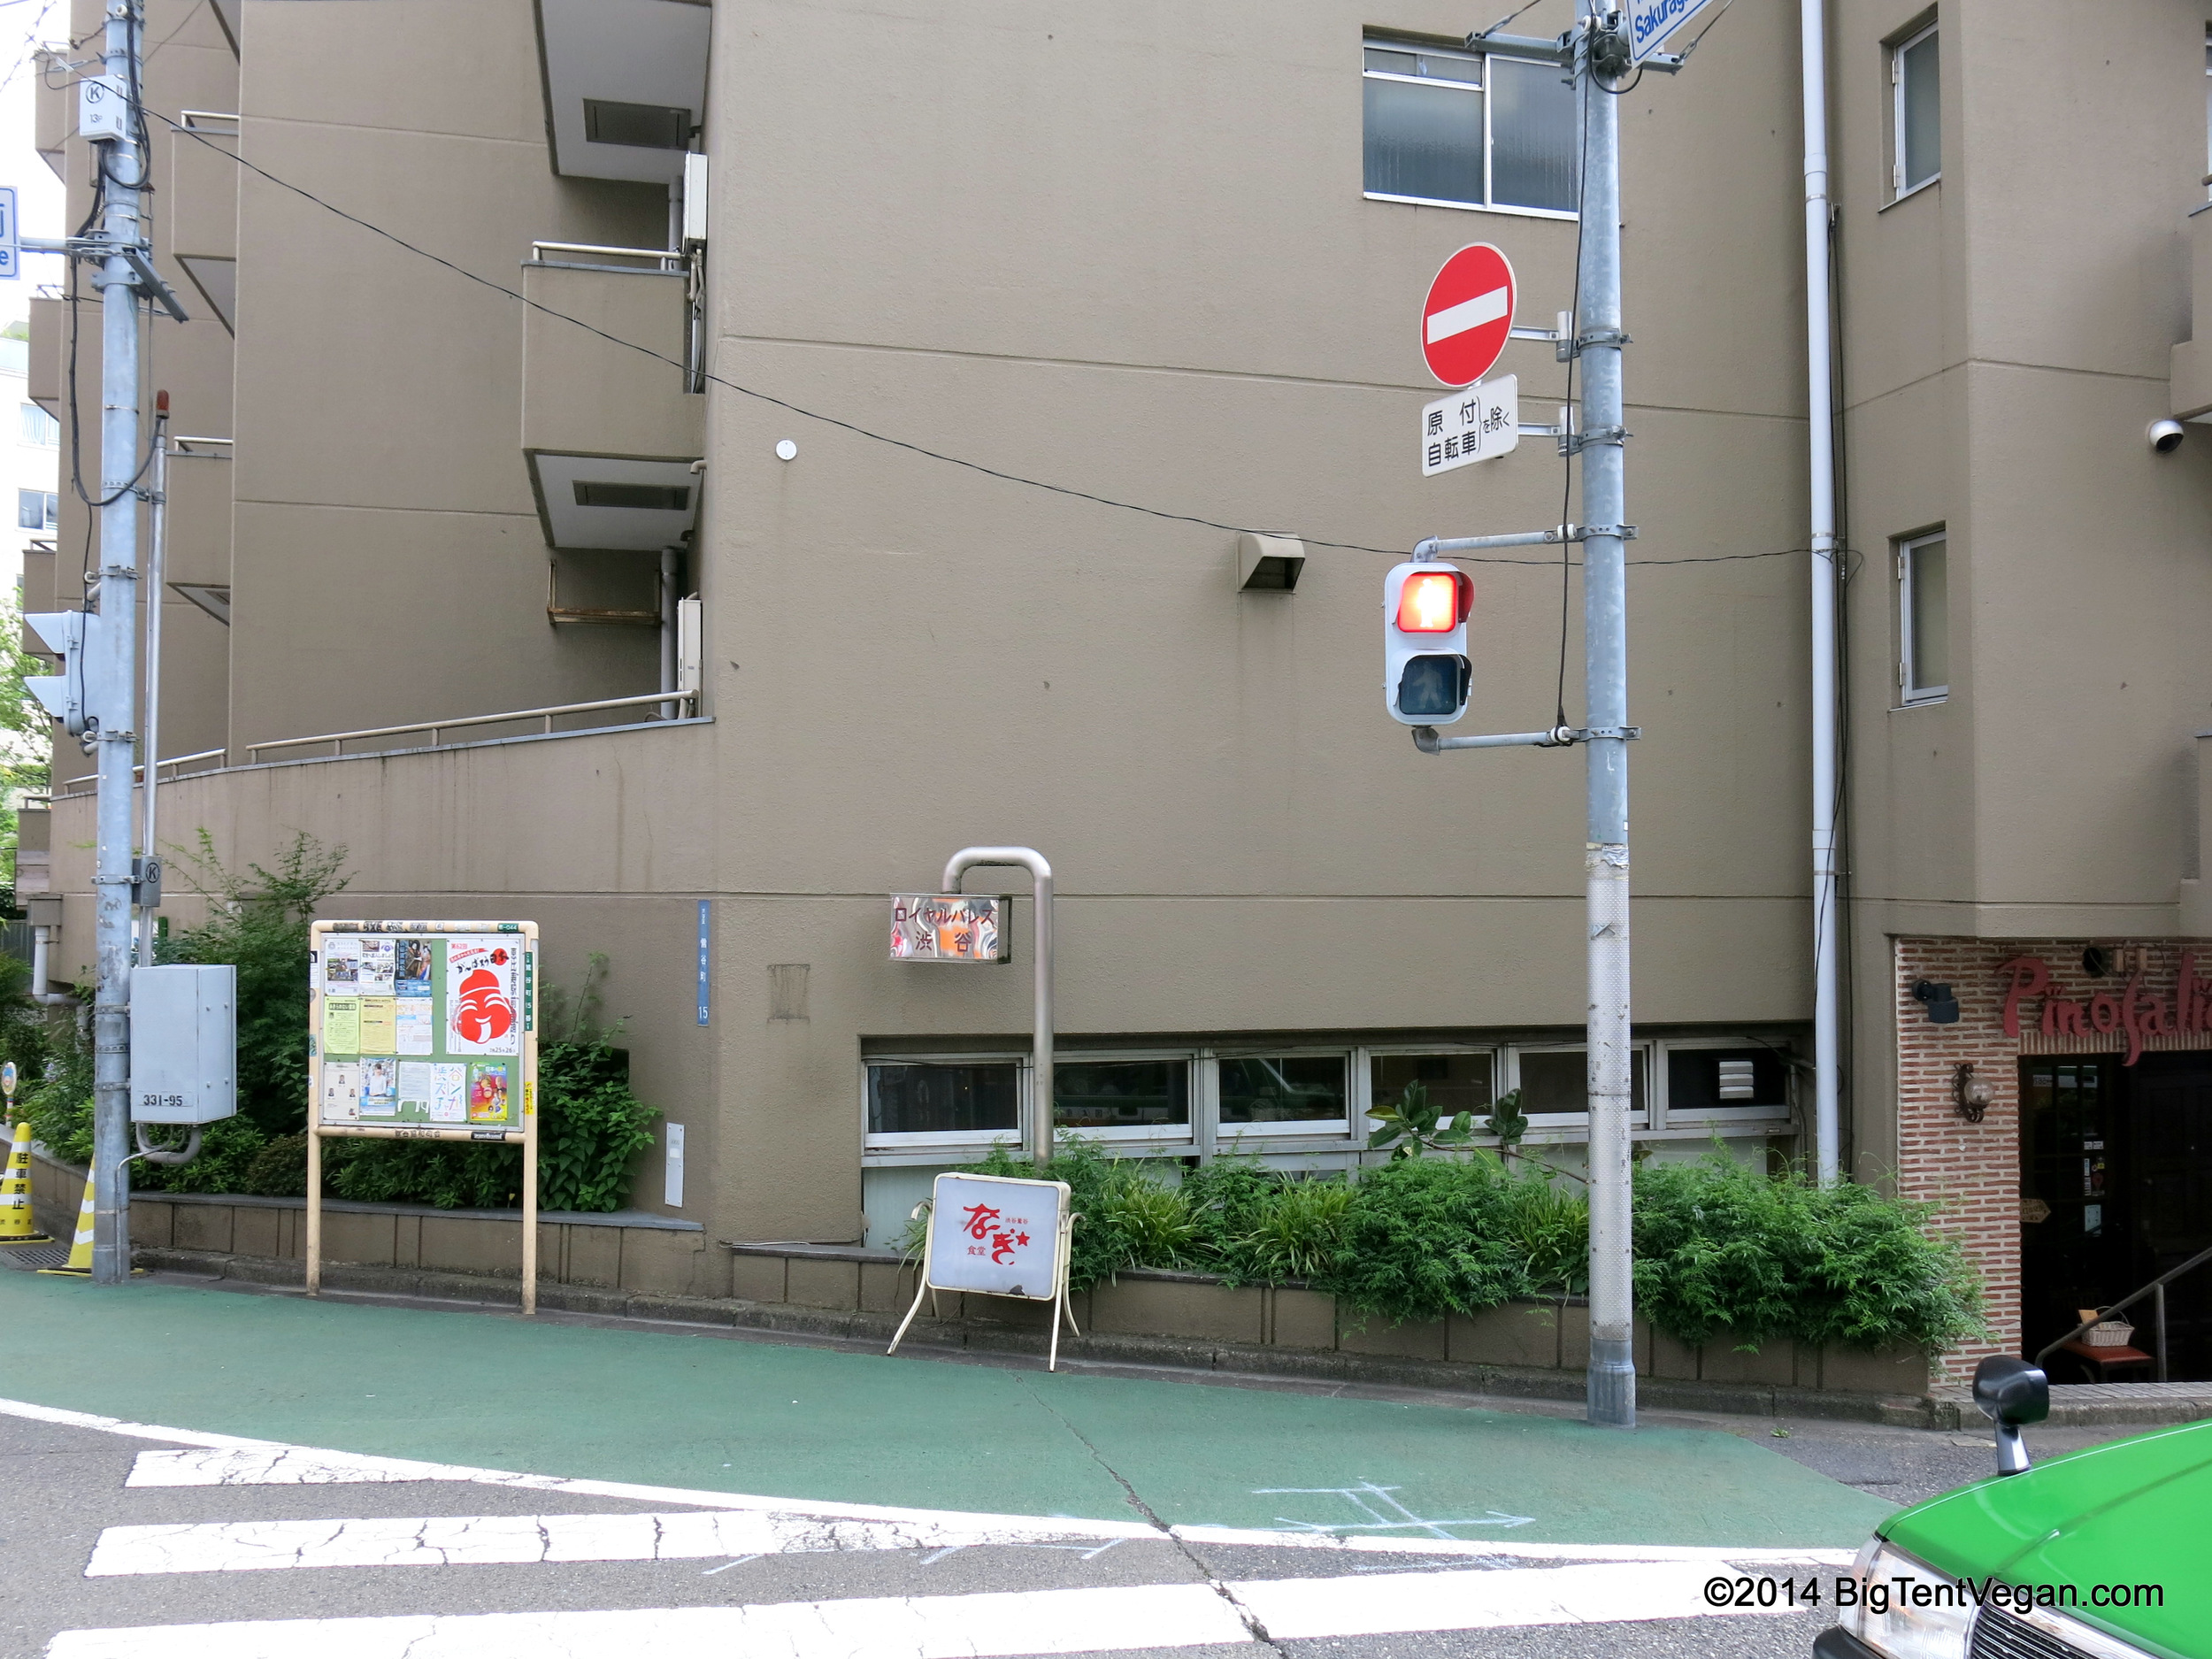 View of Nagi-Shokudo from the street